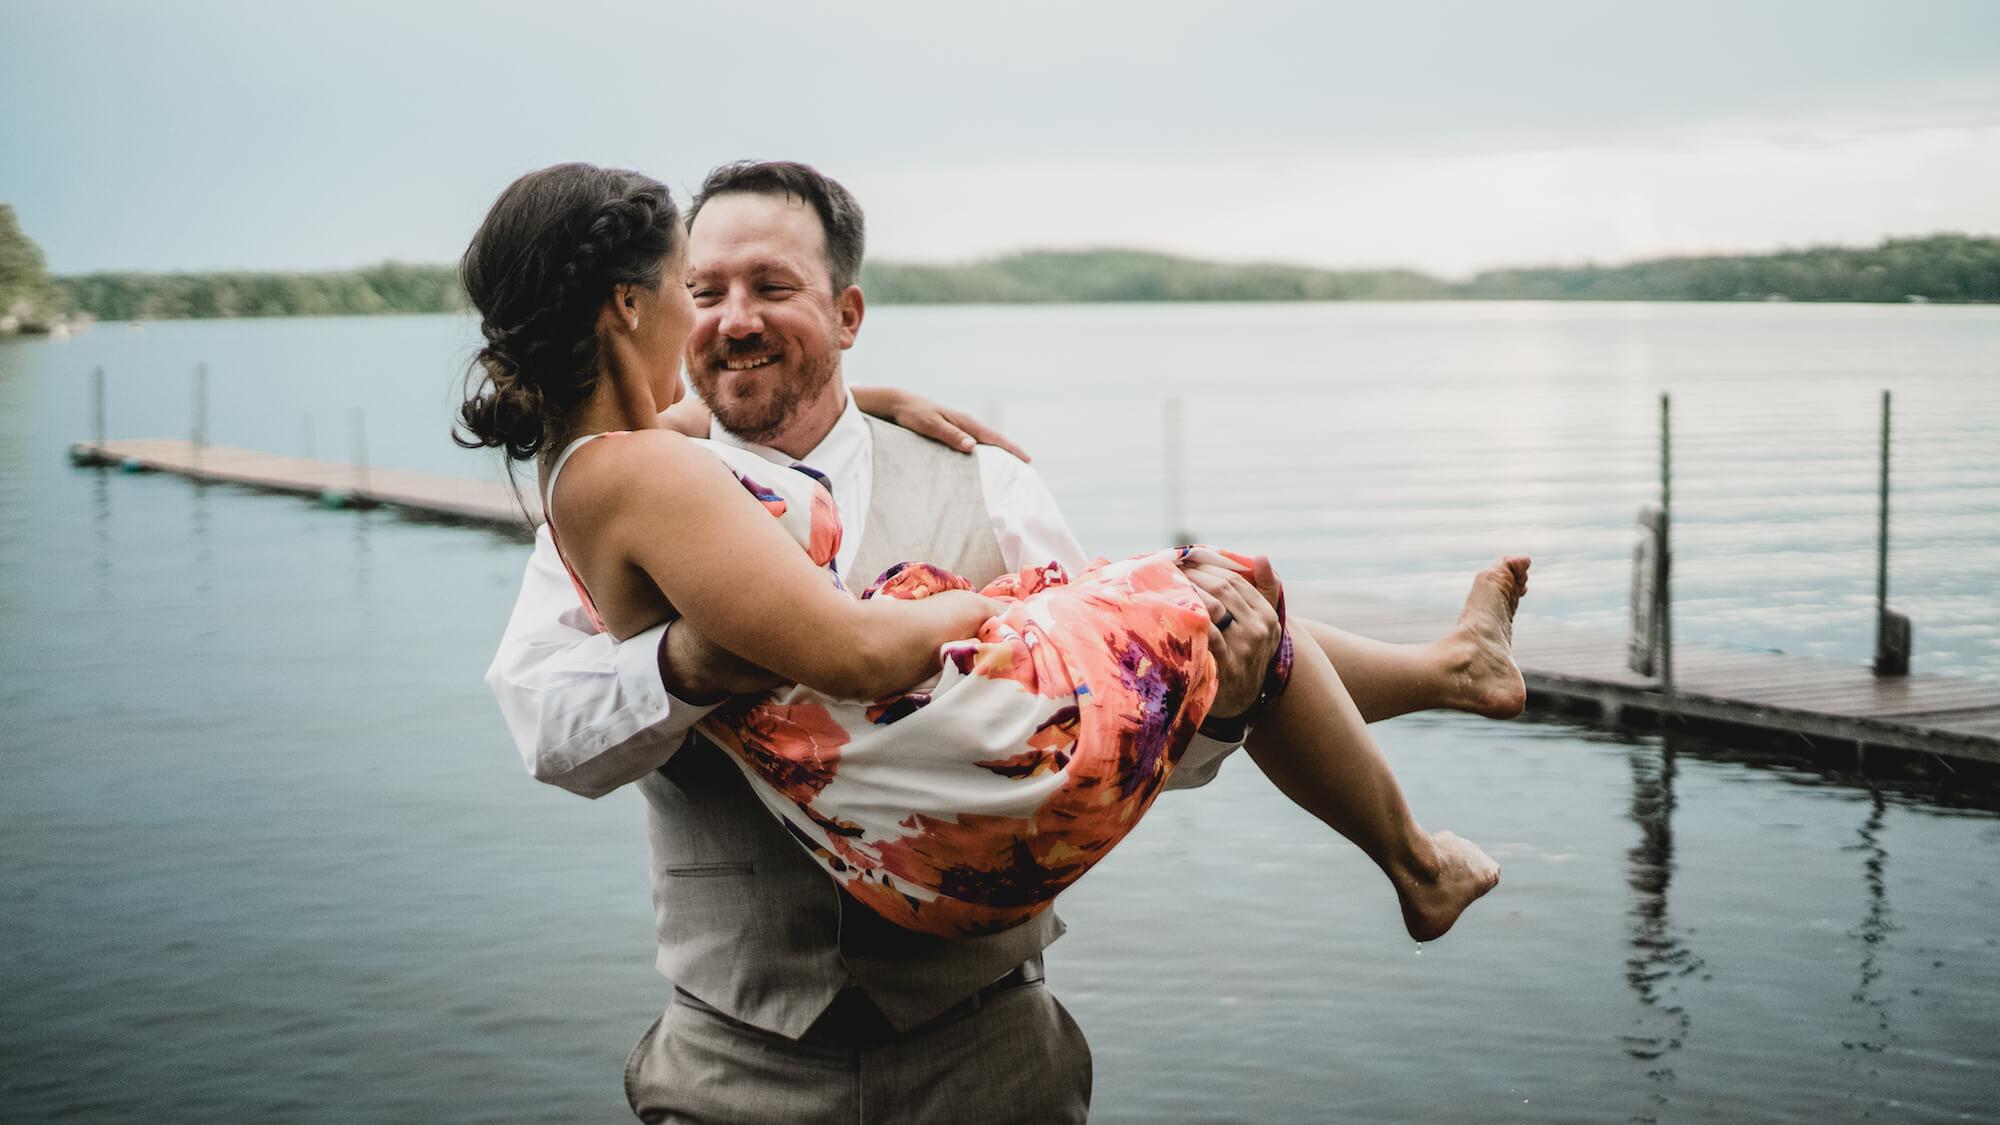 engle-olson-maddy-pat-mn-wedding-photography-46.jpg